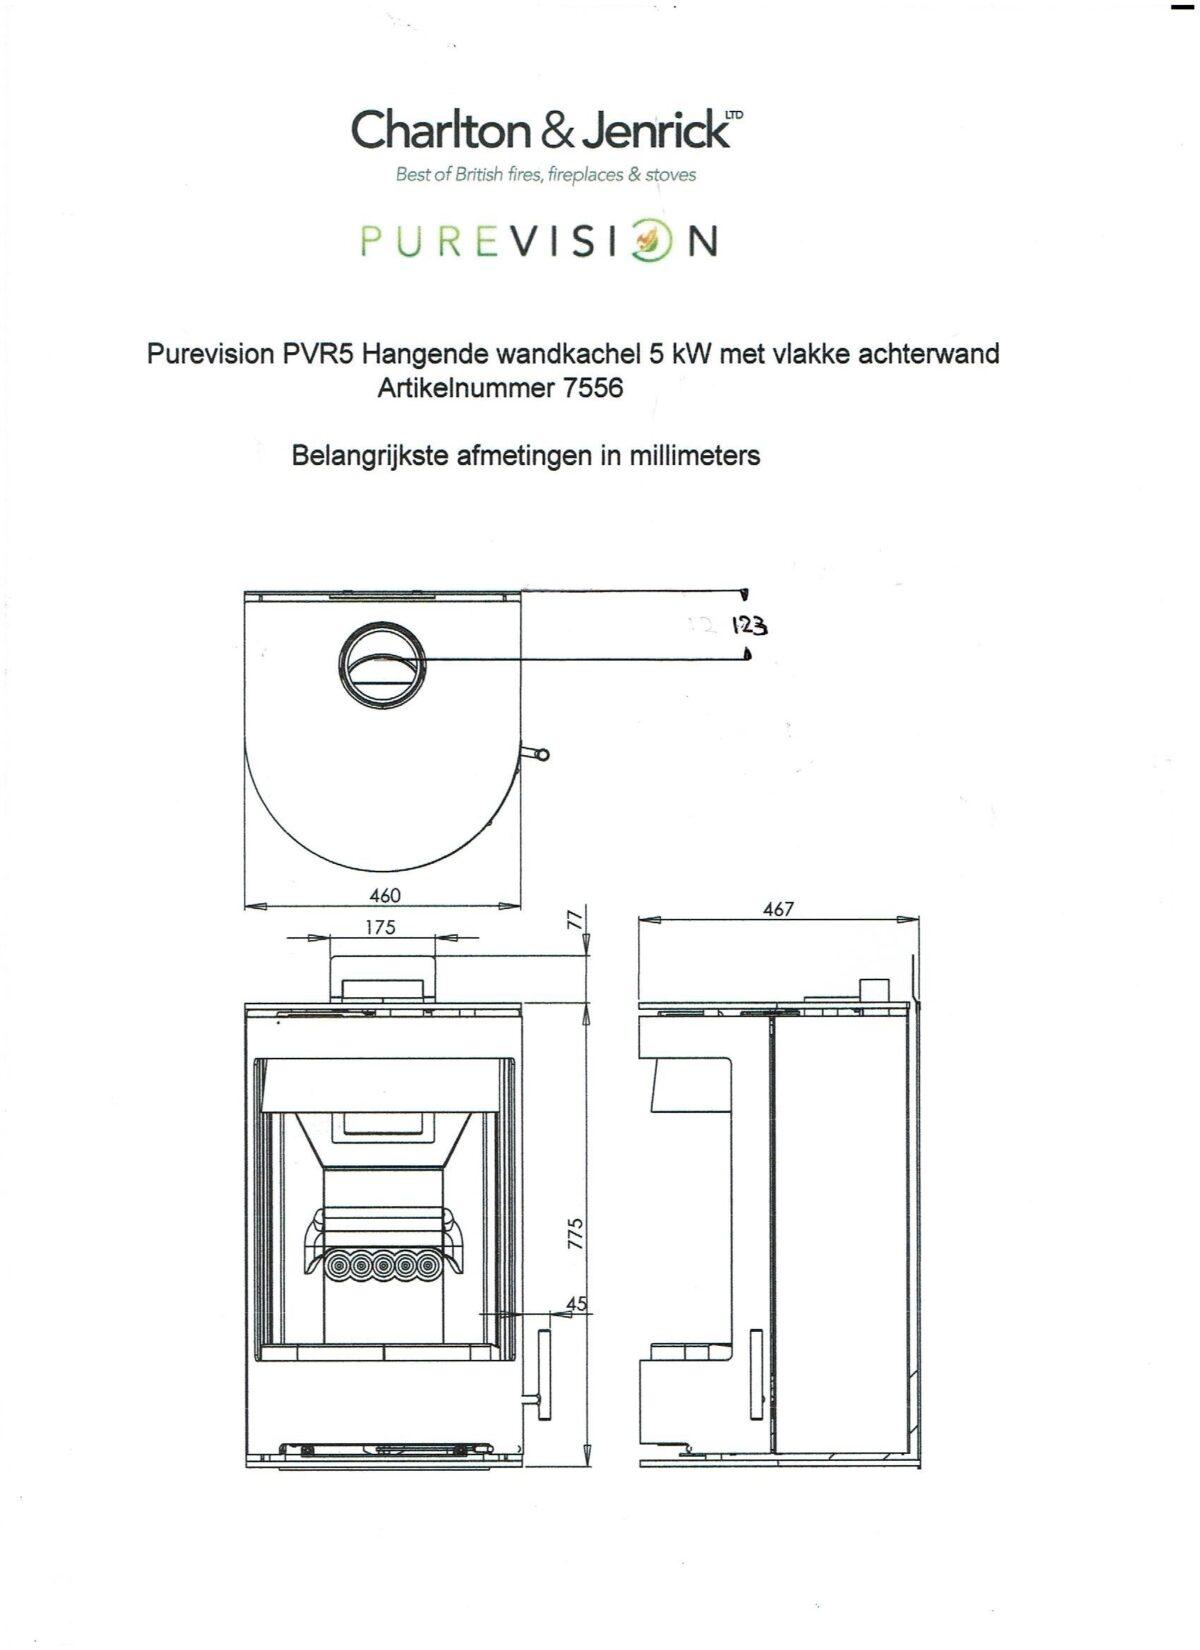 charlton-jenrick-purevision-wandkachel-line_image